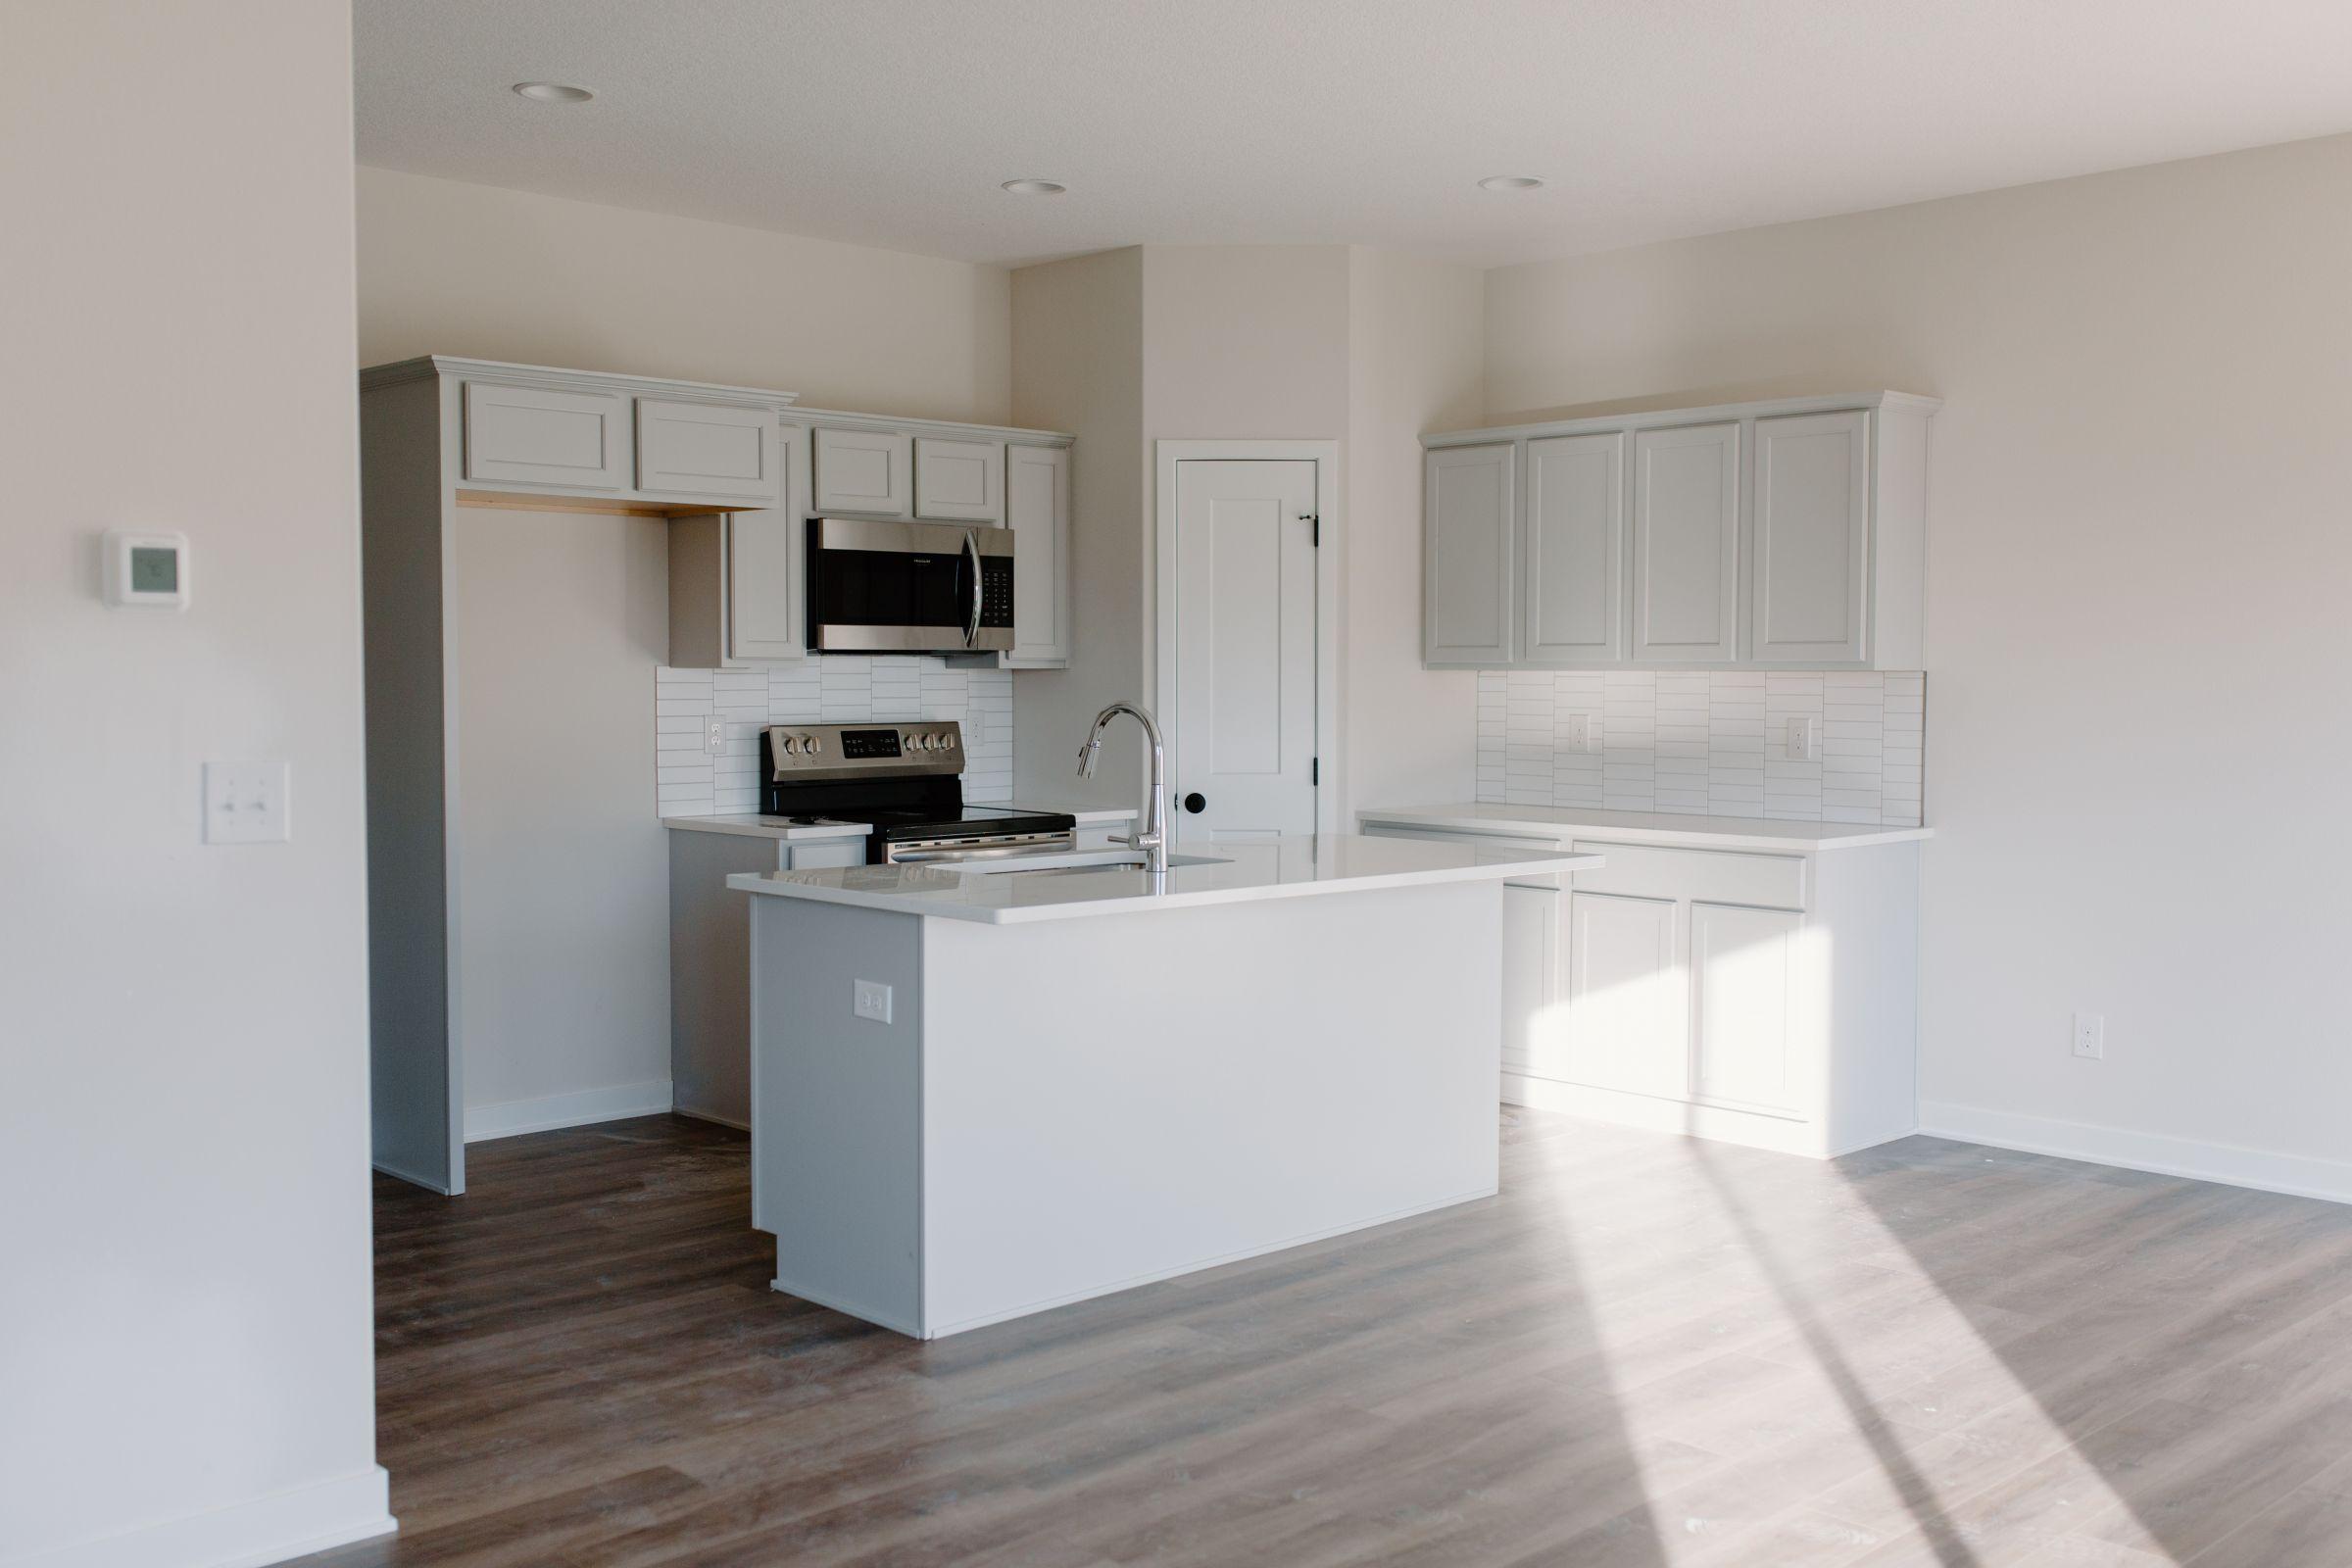 residential-warren-county-iowa-0-acres-listing-number-15365-2-2021-02-17-220734.jpg